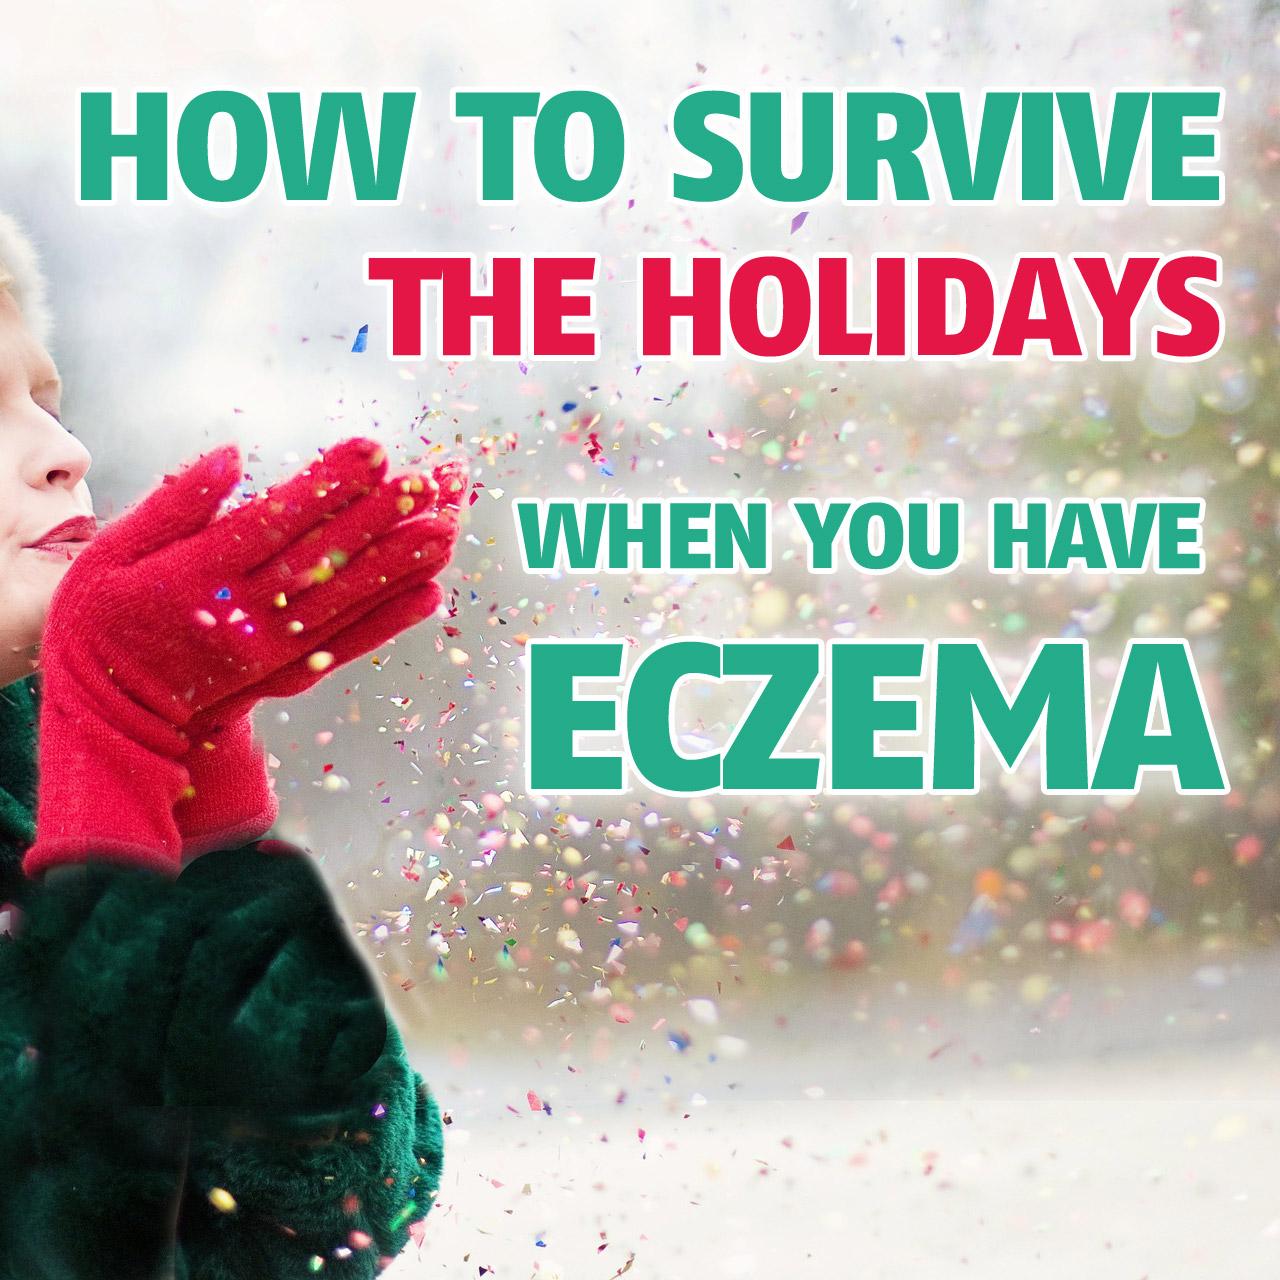 eczema_holidays